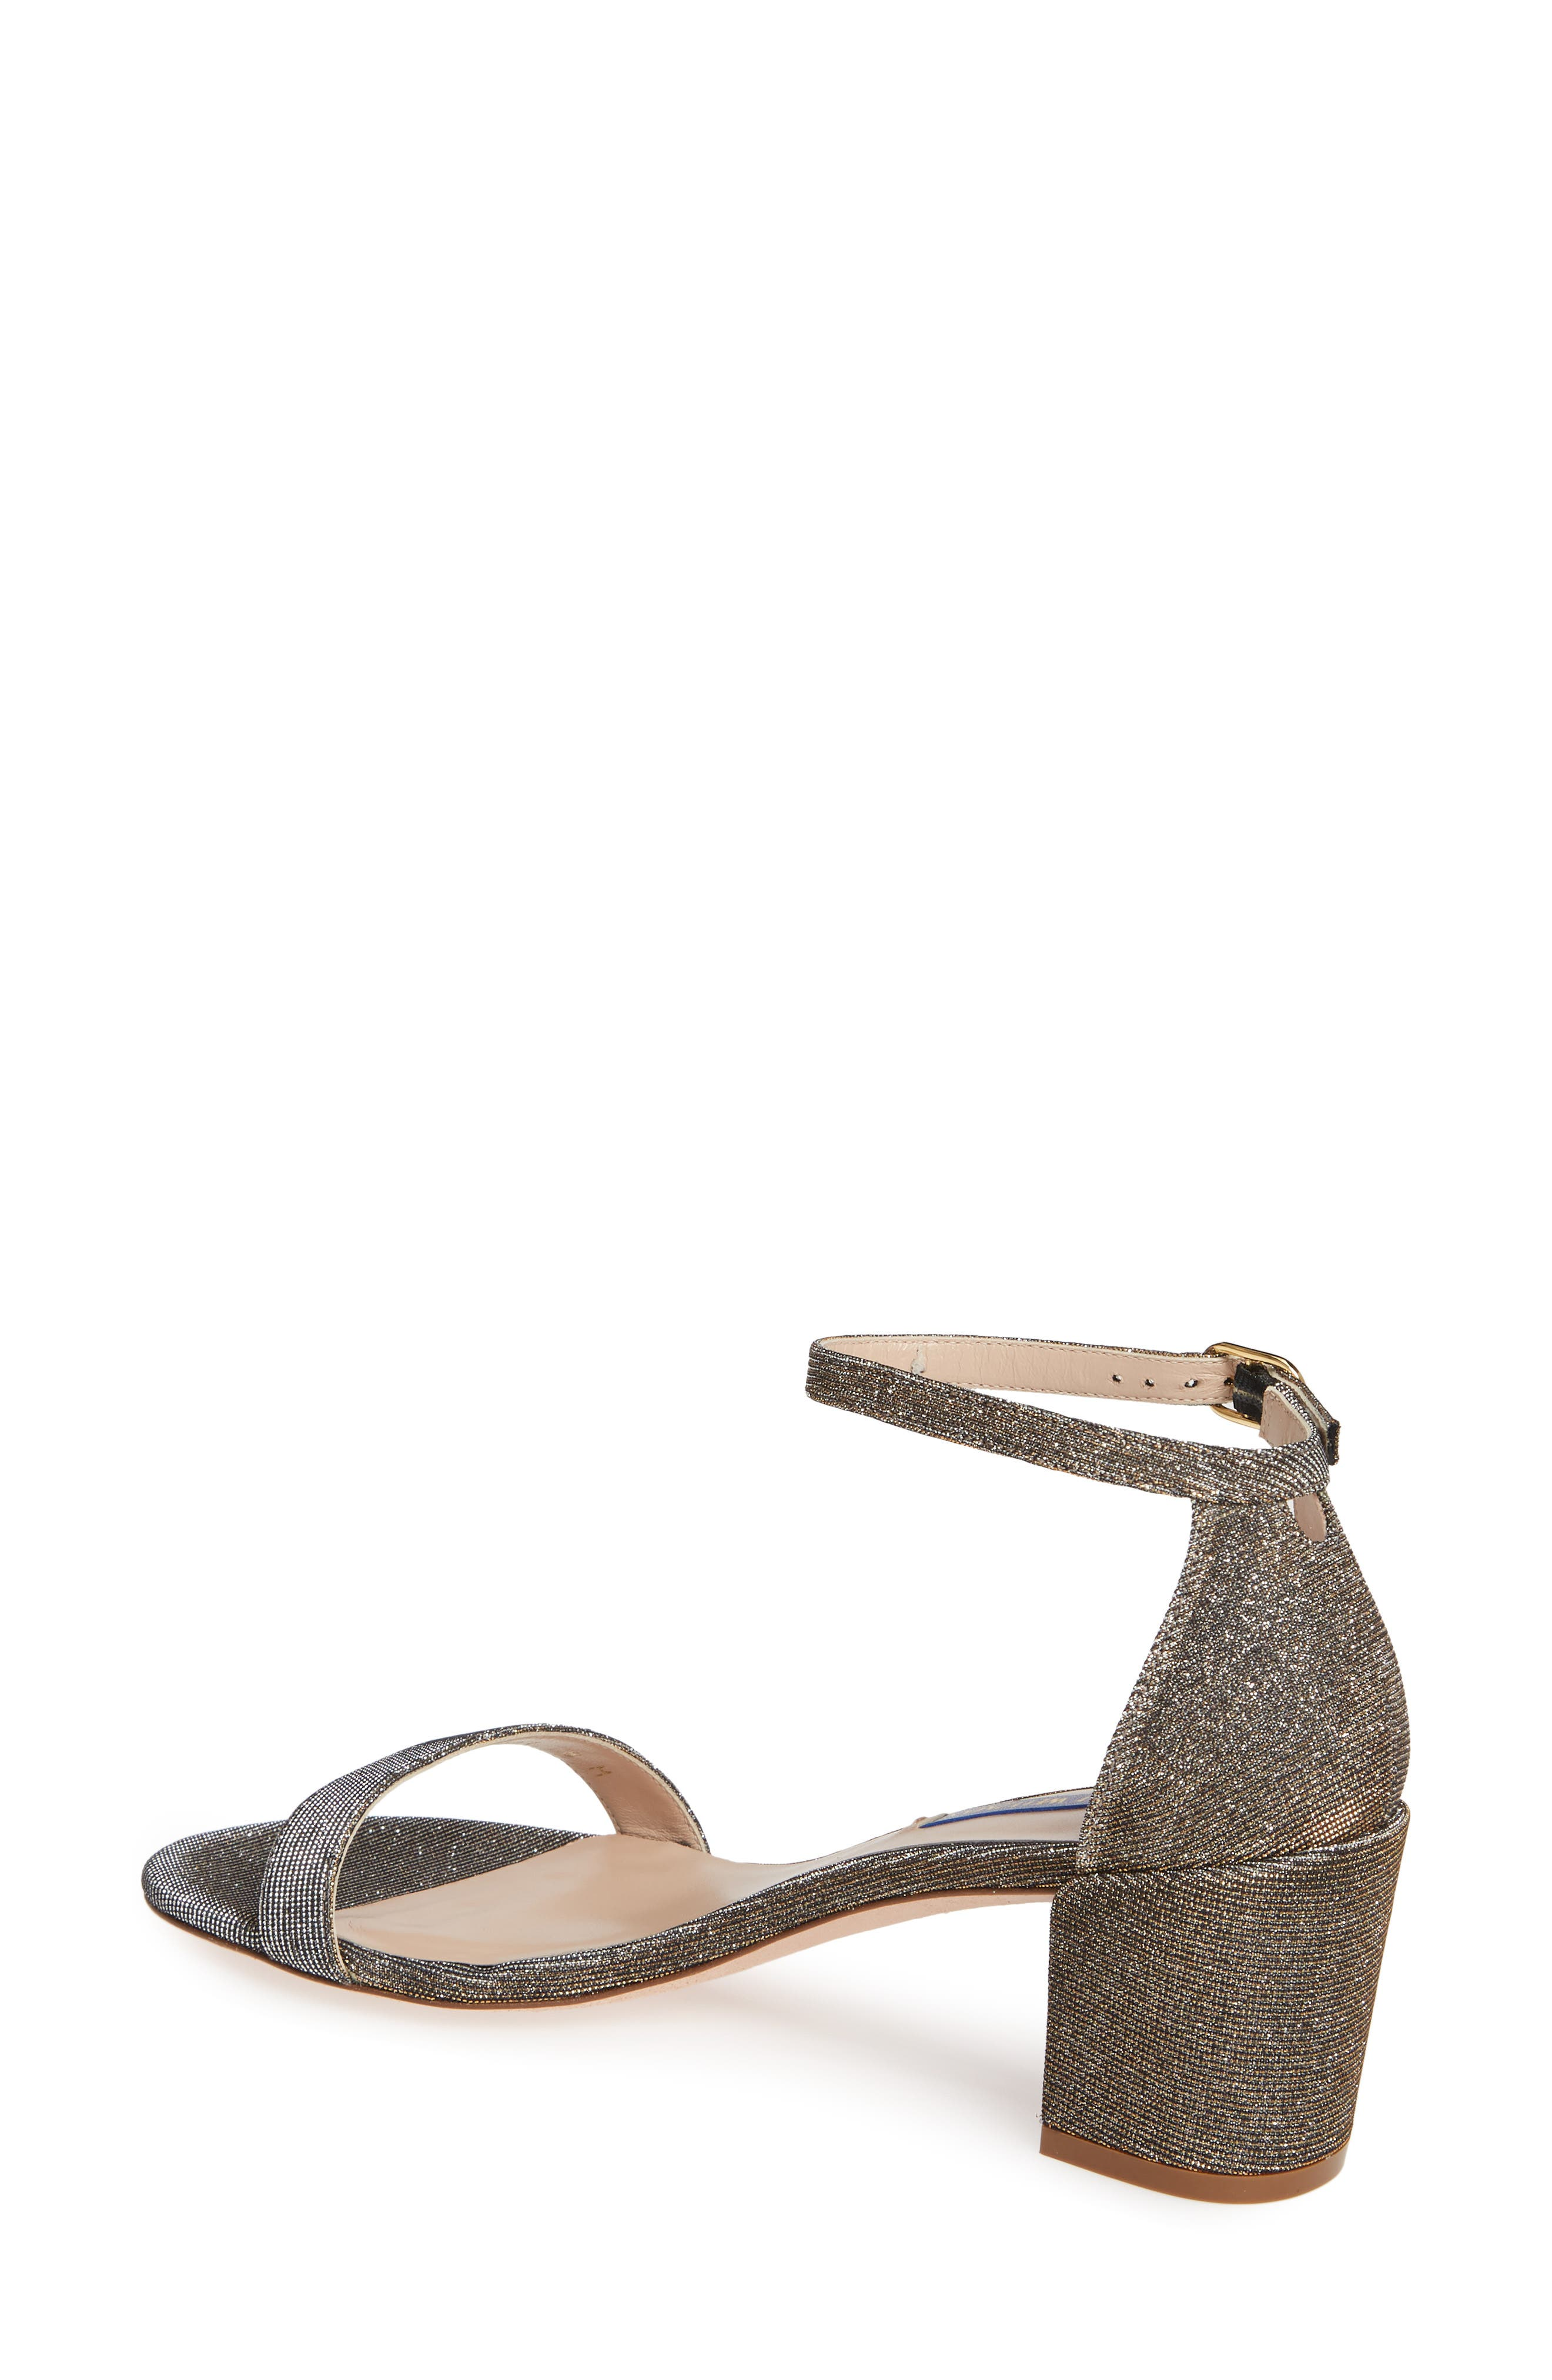 STUART WEITZMAN,                             Simple Ankle Strap Sandal,                             Alternate thumbnail 2, color,                             GOLD NIGHTTIME